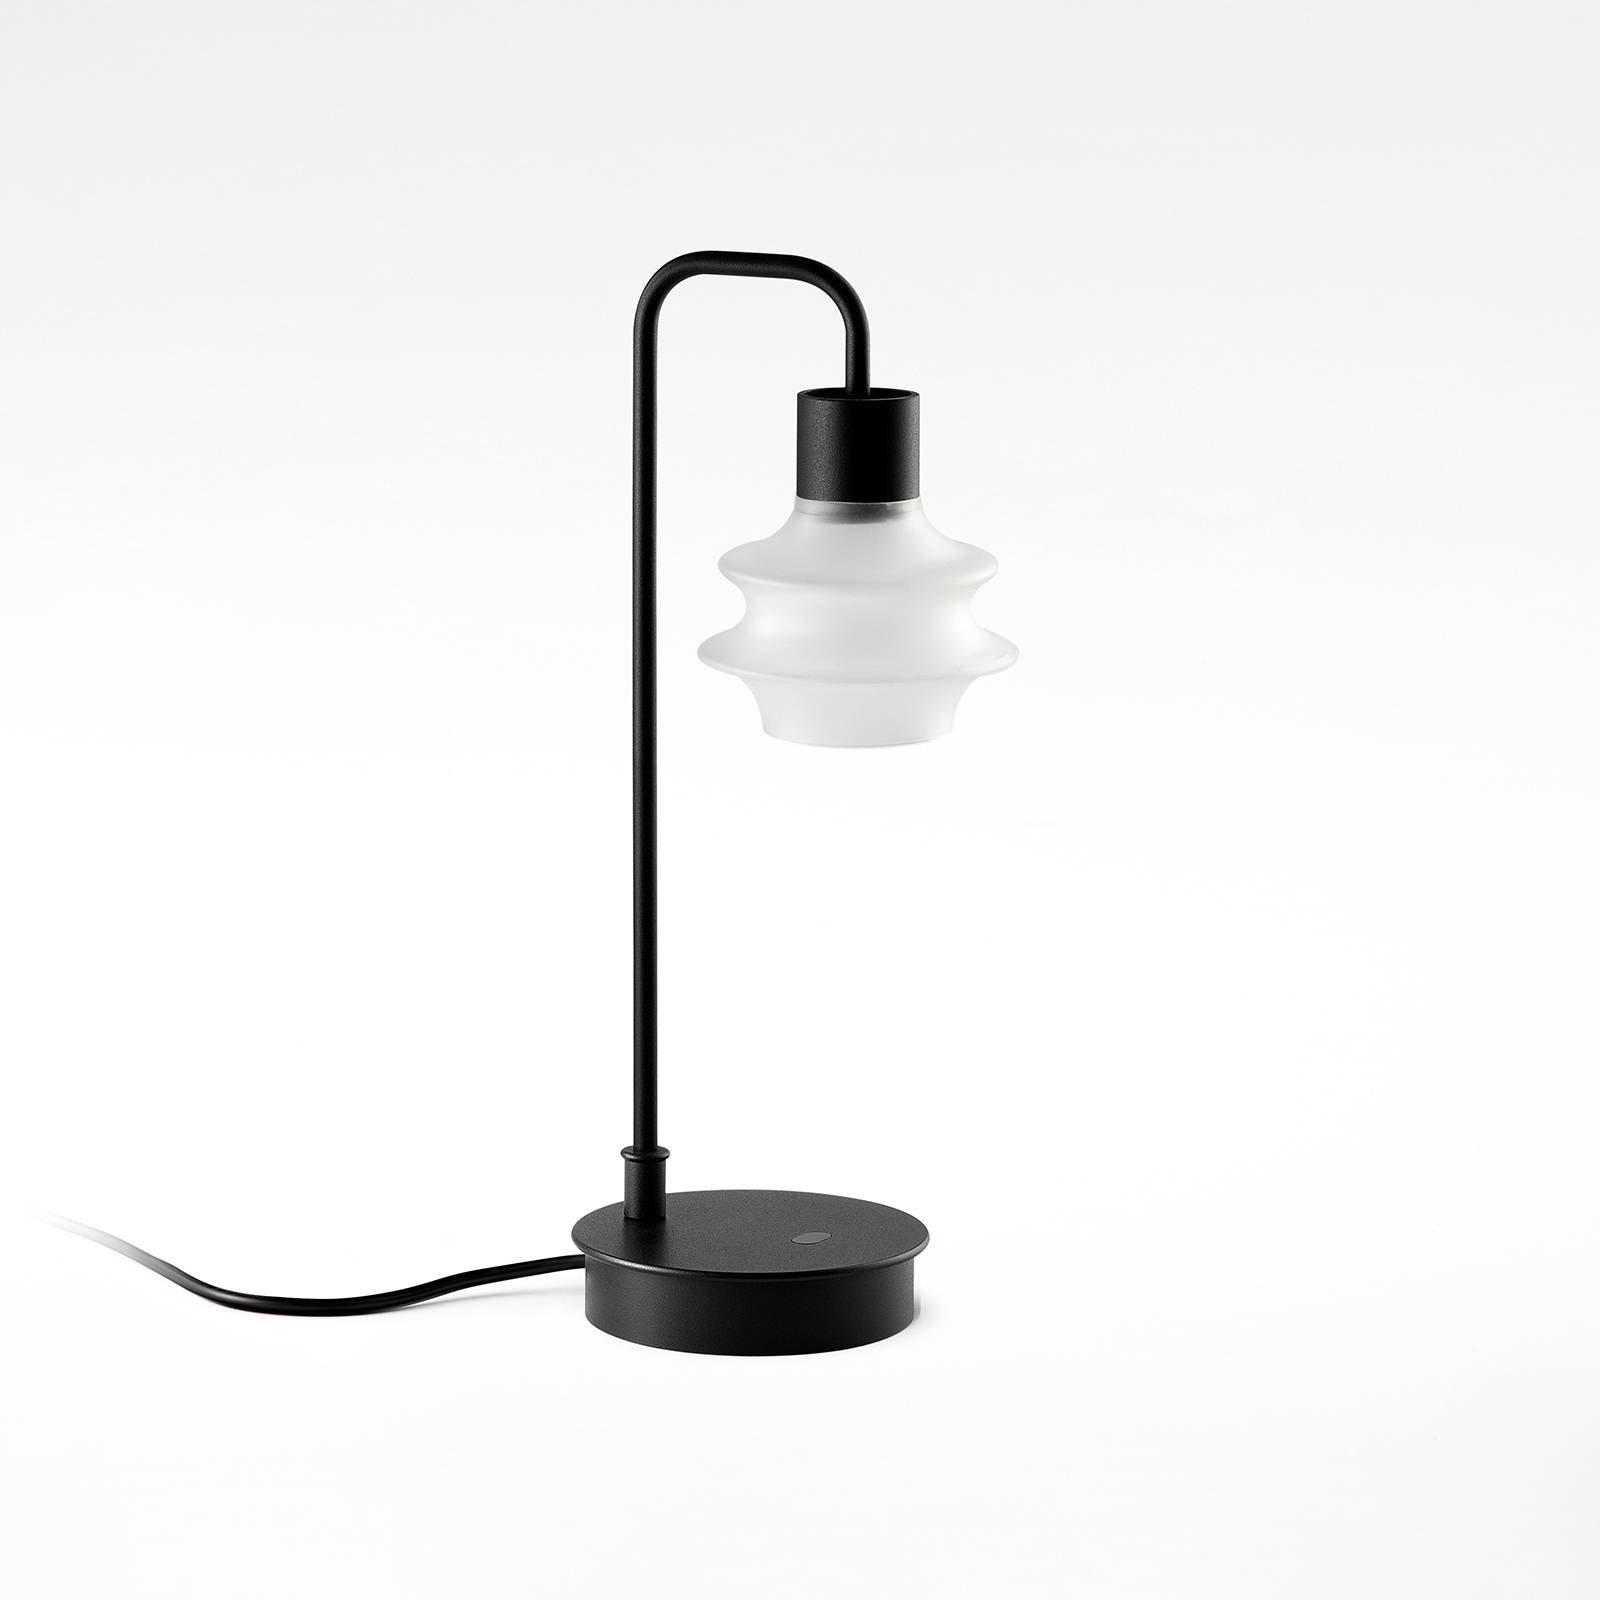 Bover Drop M/36 LED-bordlampe matt-hvit